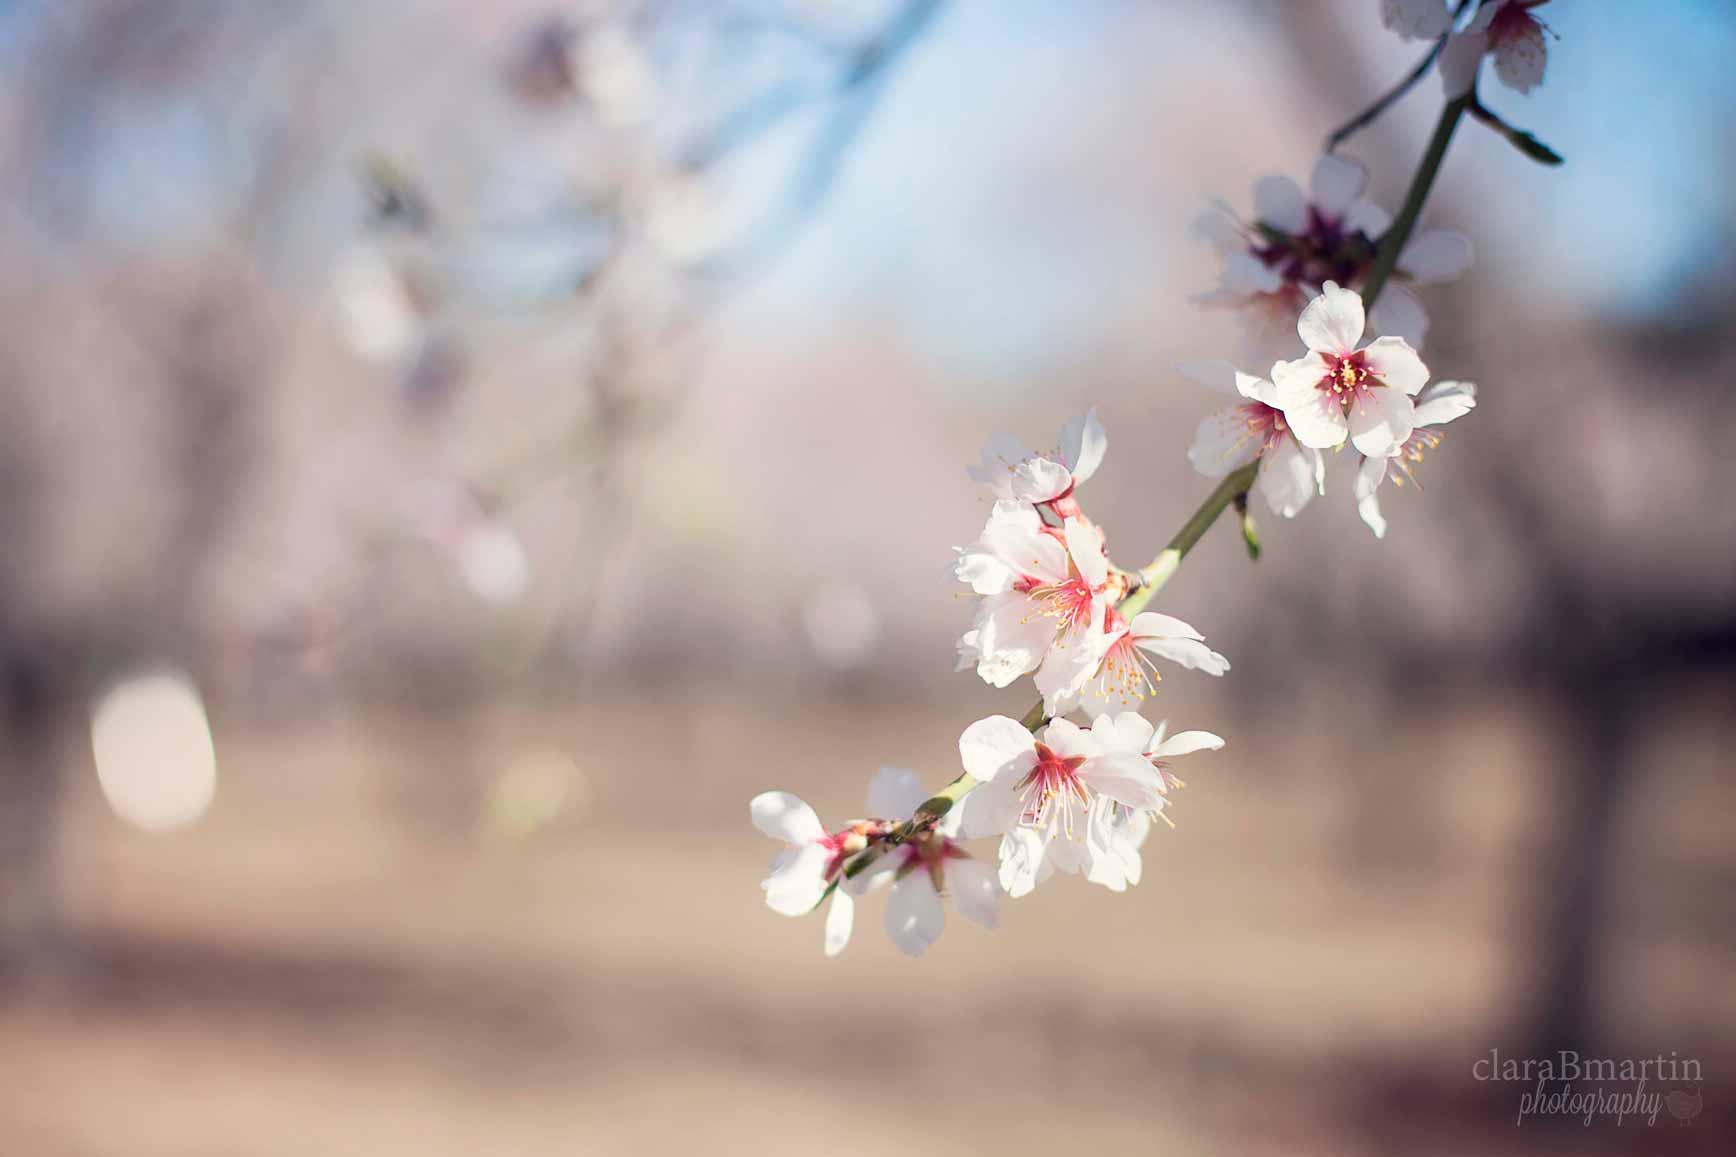 Primavera_claraBmartin01